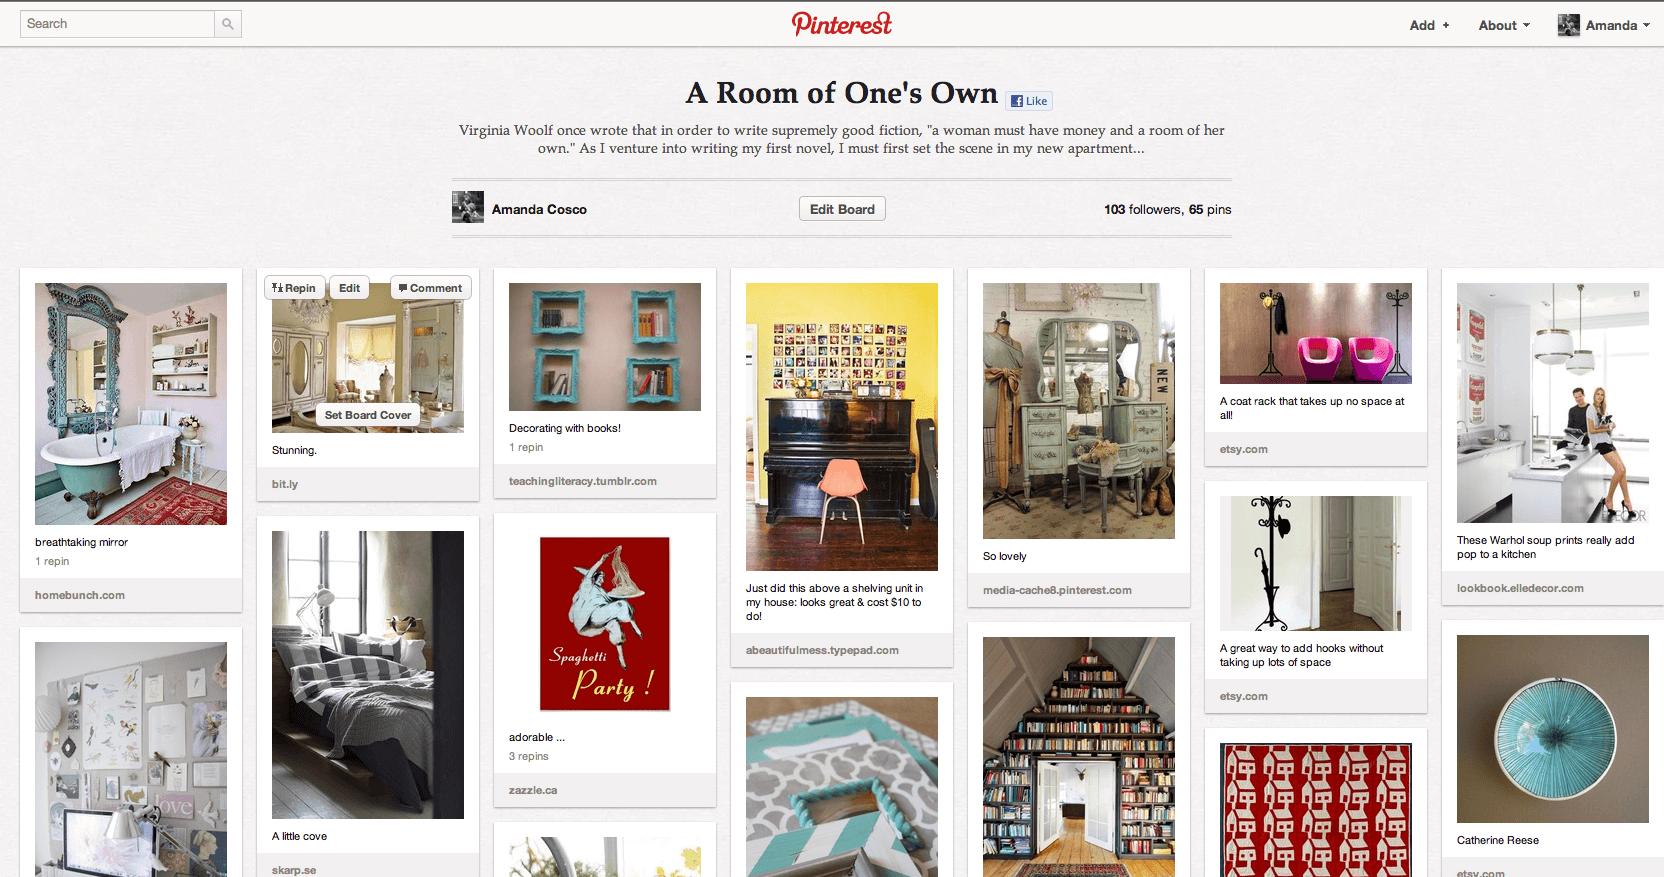 Screenshot of Pinterest homepage